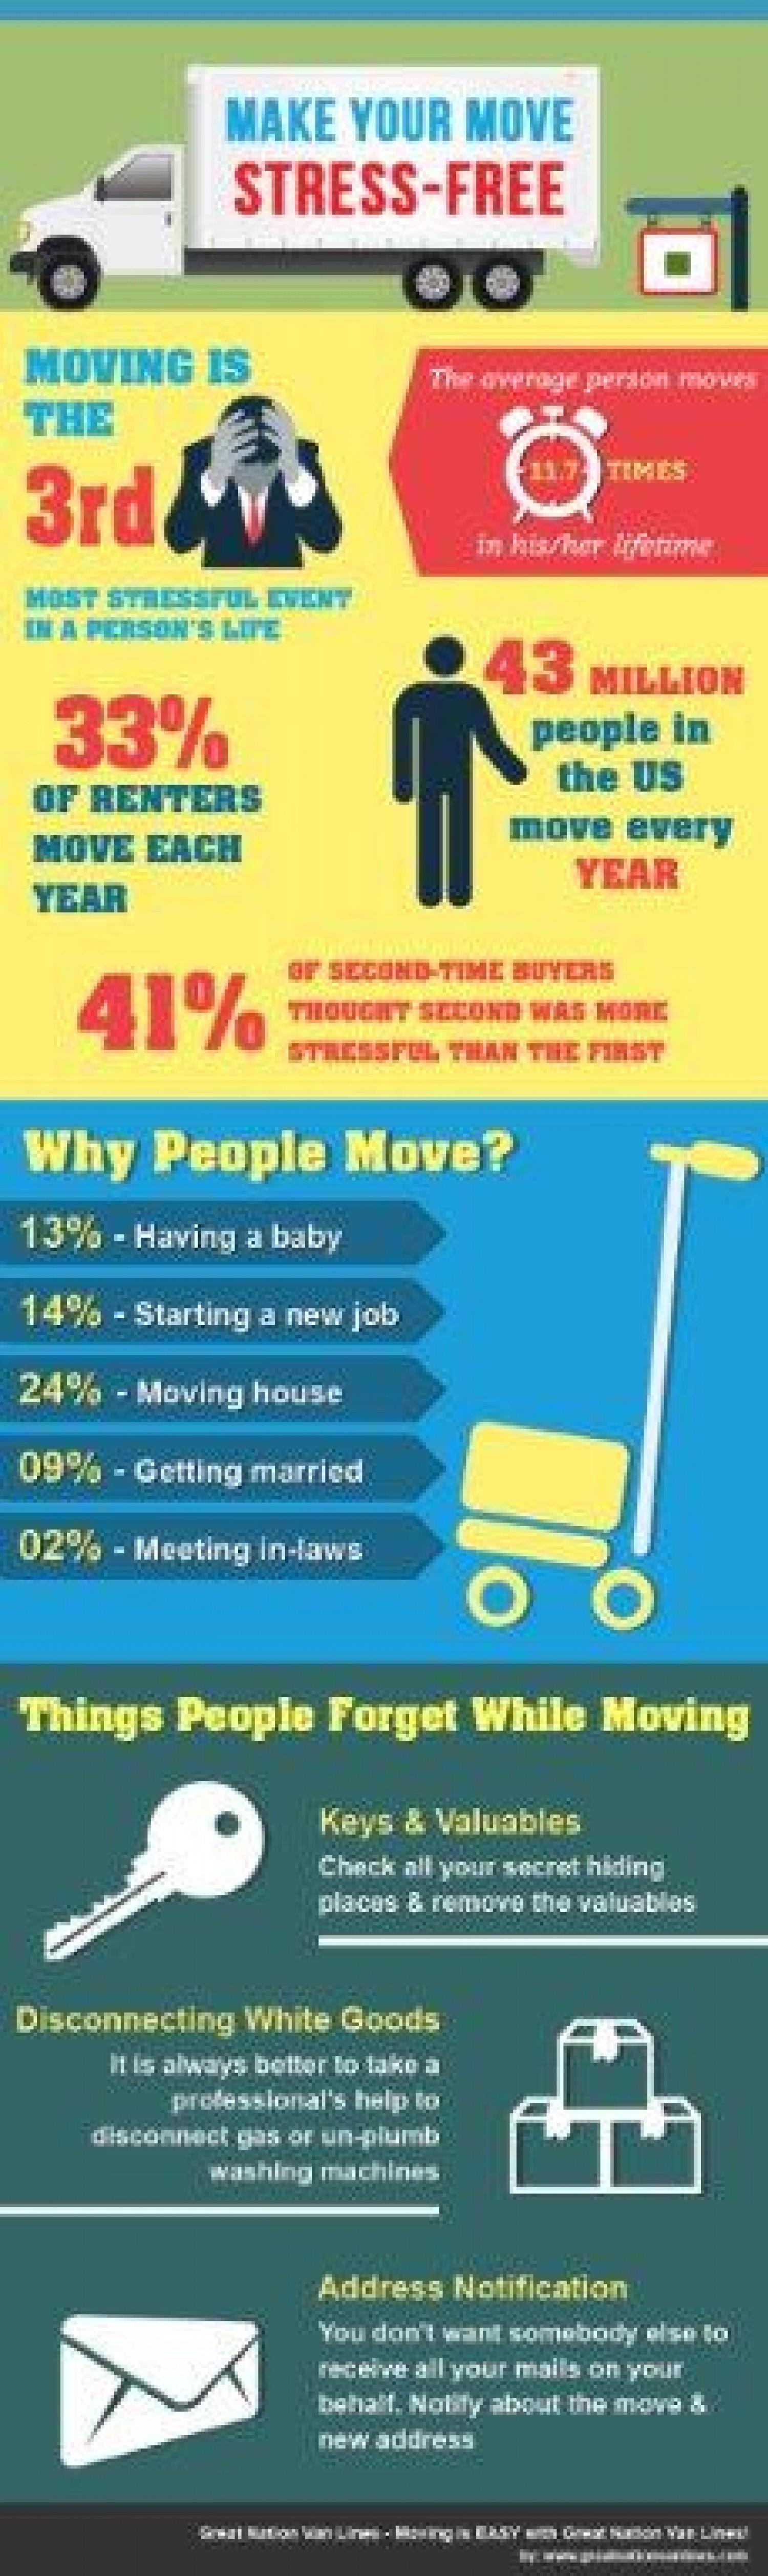 make-your-move-stress-free_52b2a14950904_w1500